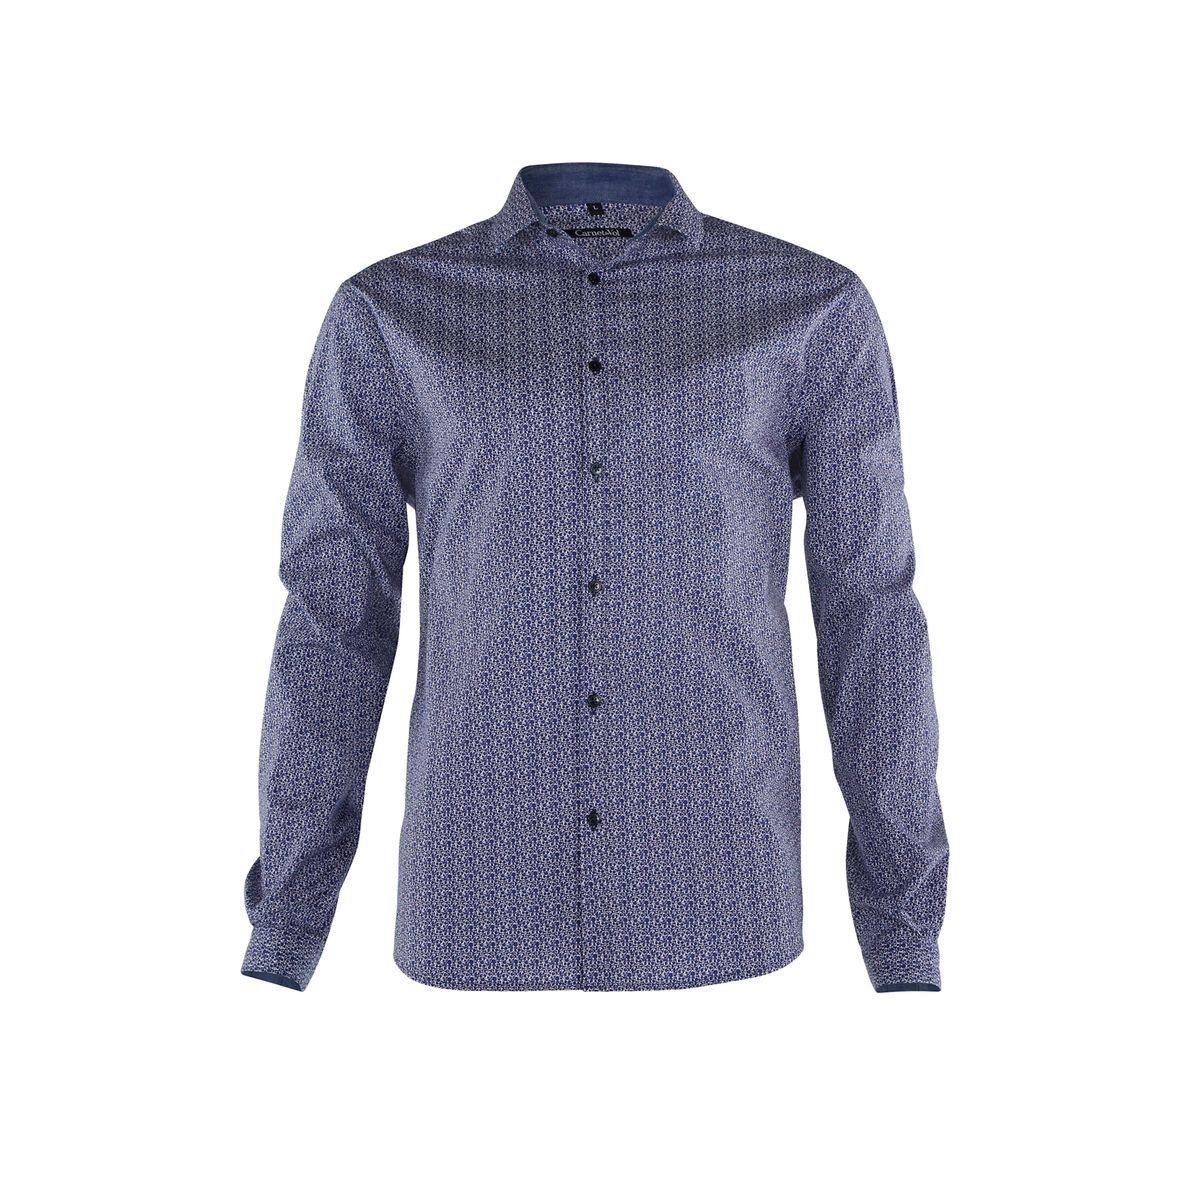 Chemise fond bleu imprime micro dessin blanc